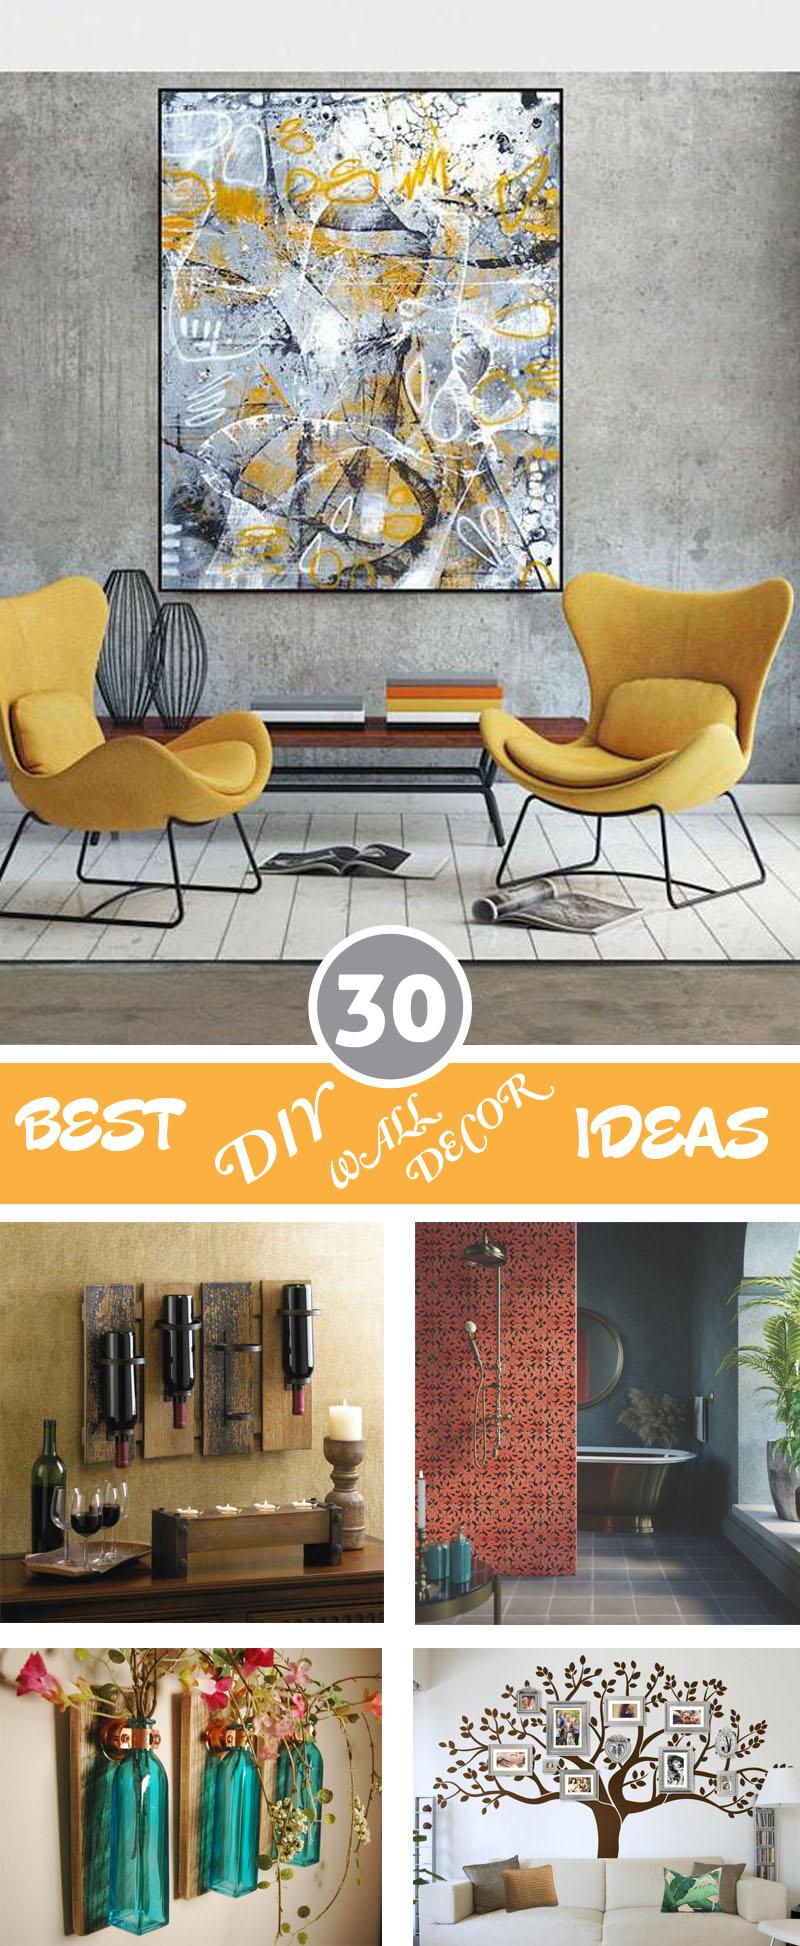 Best DIY Wall Decor Ideas